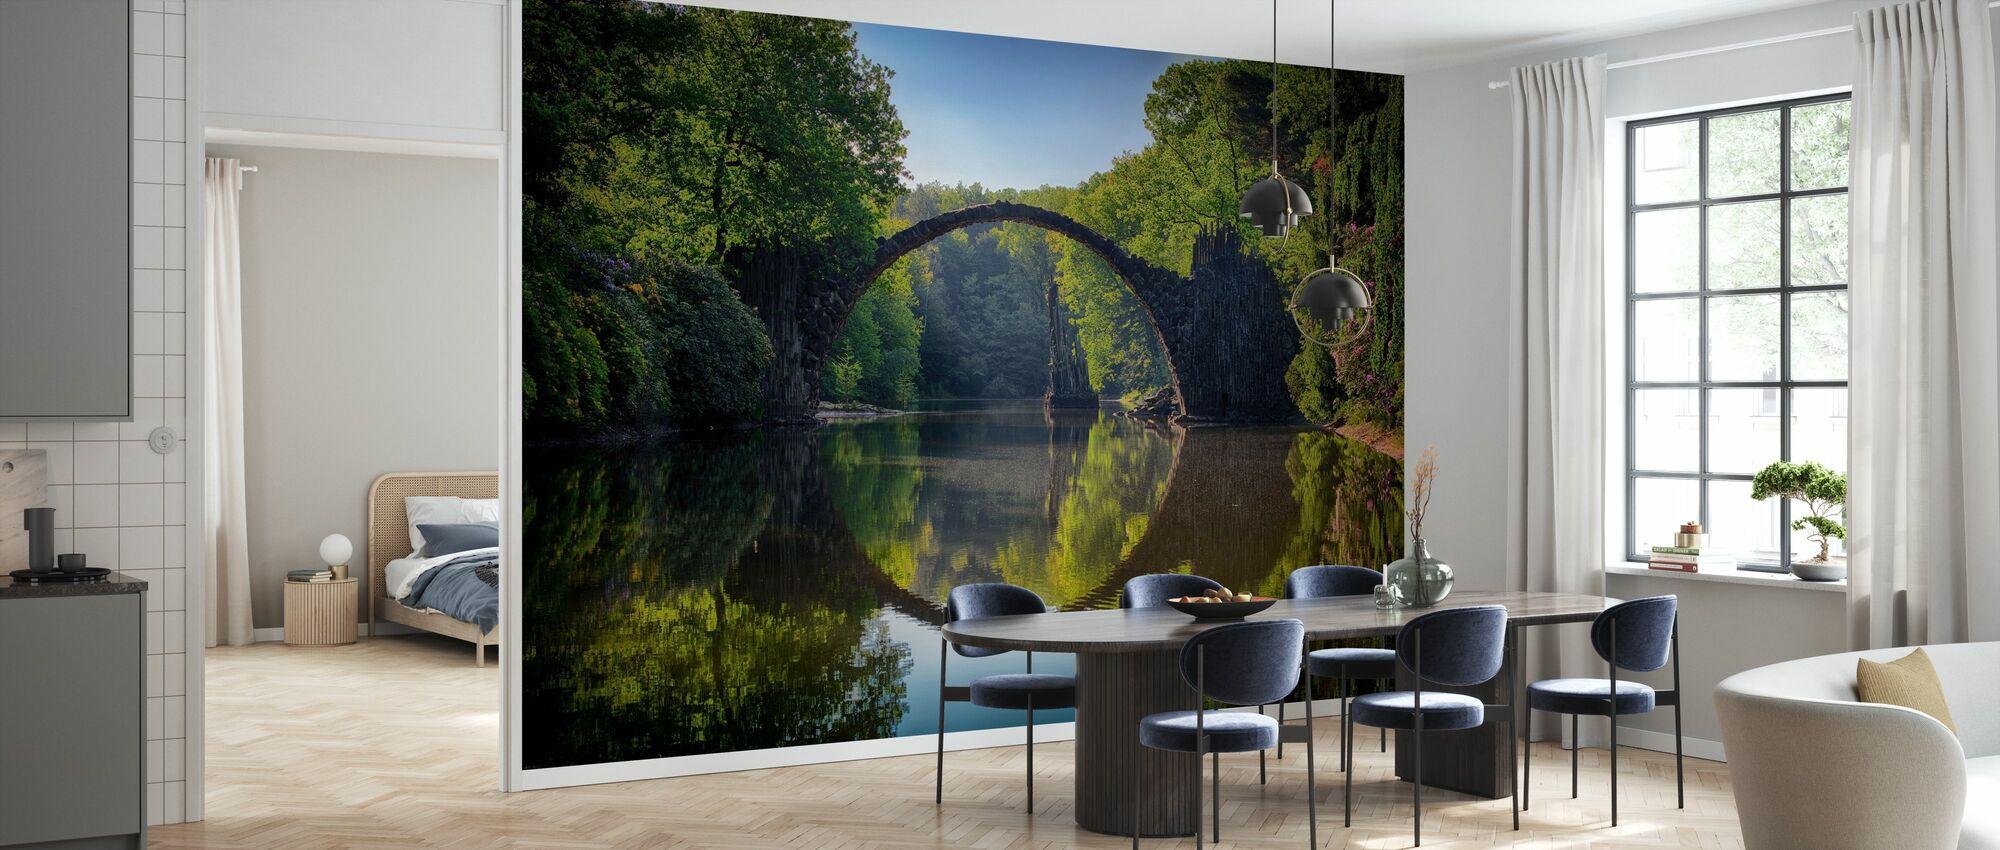 Arch Bridge - Tapet - Kök